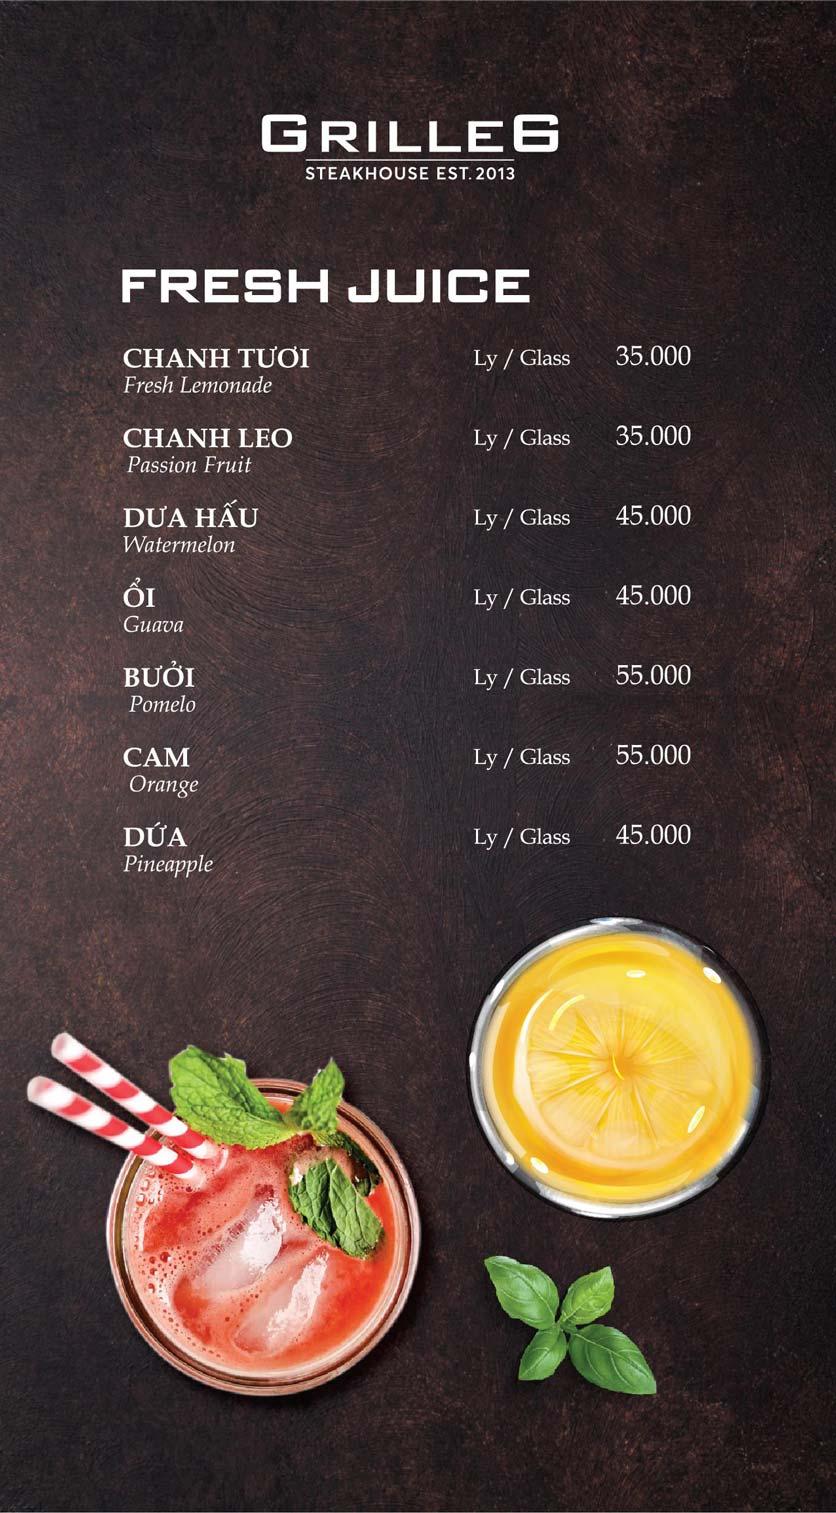 Menu GRILL66 Steakhouse - Hào Nam 16